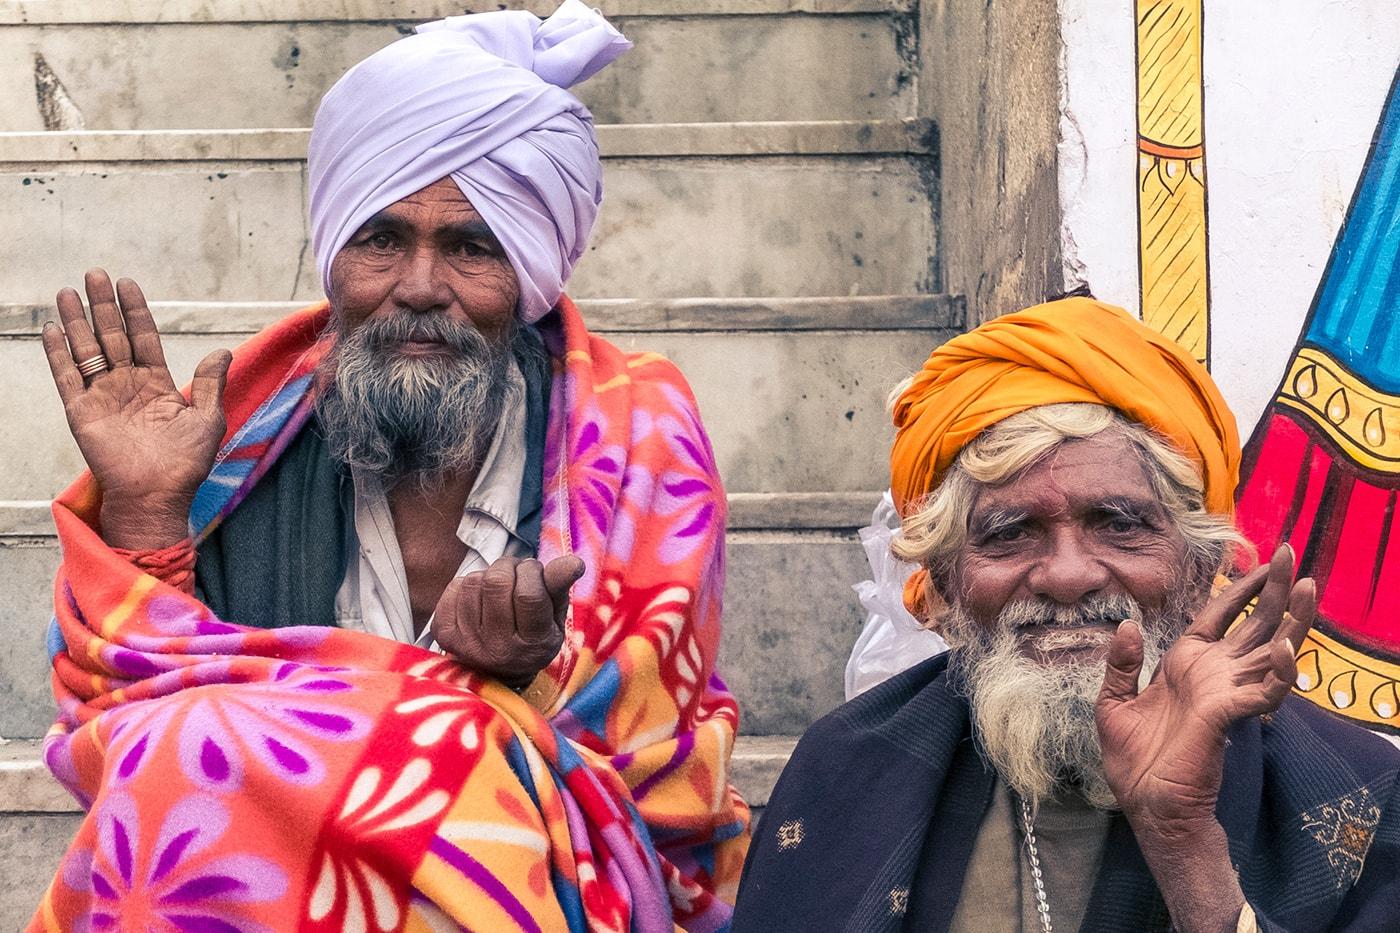 cultura indiana jodhpur senzatetto